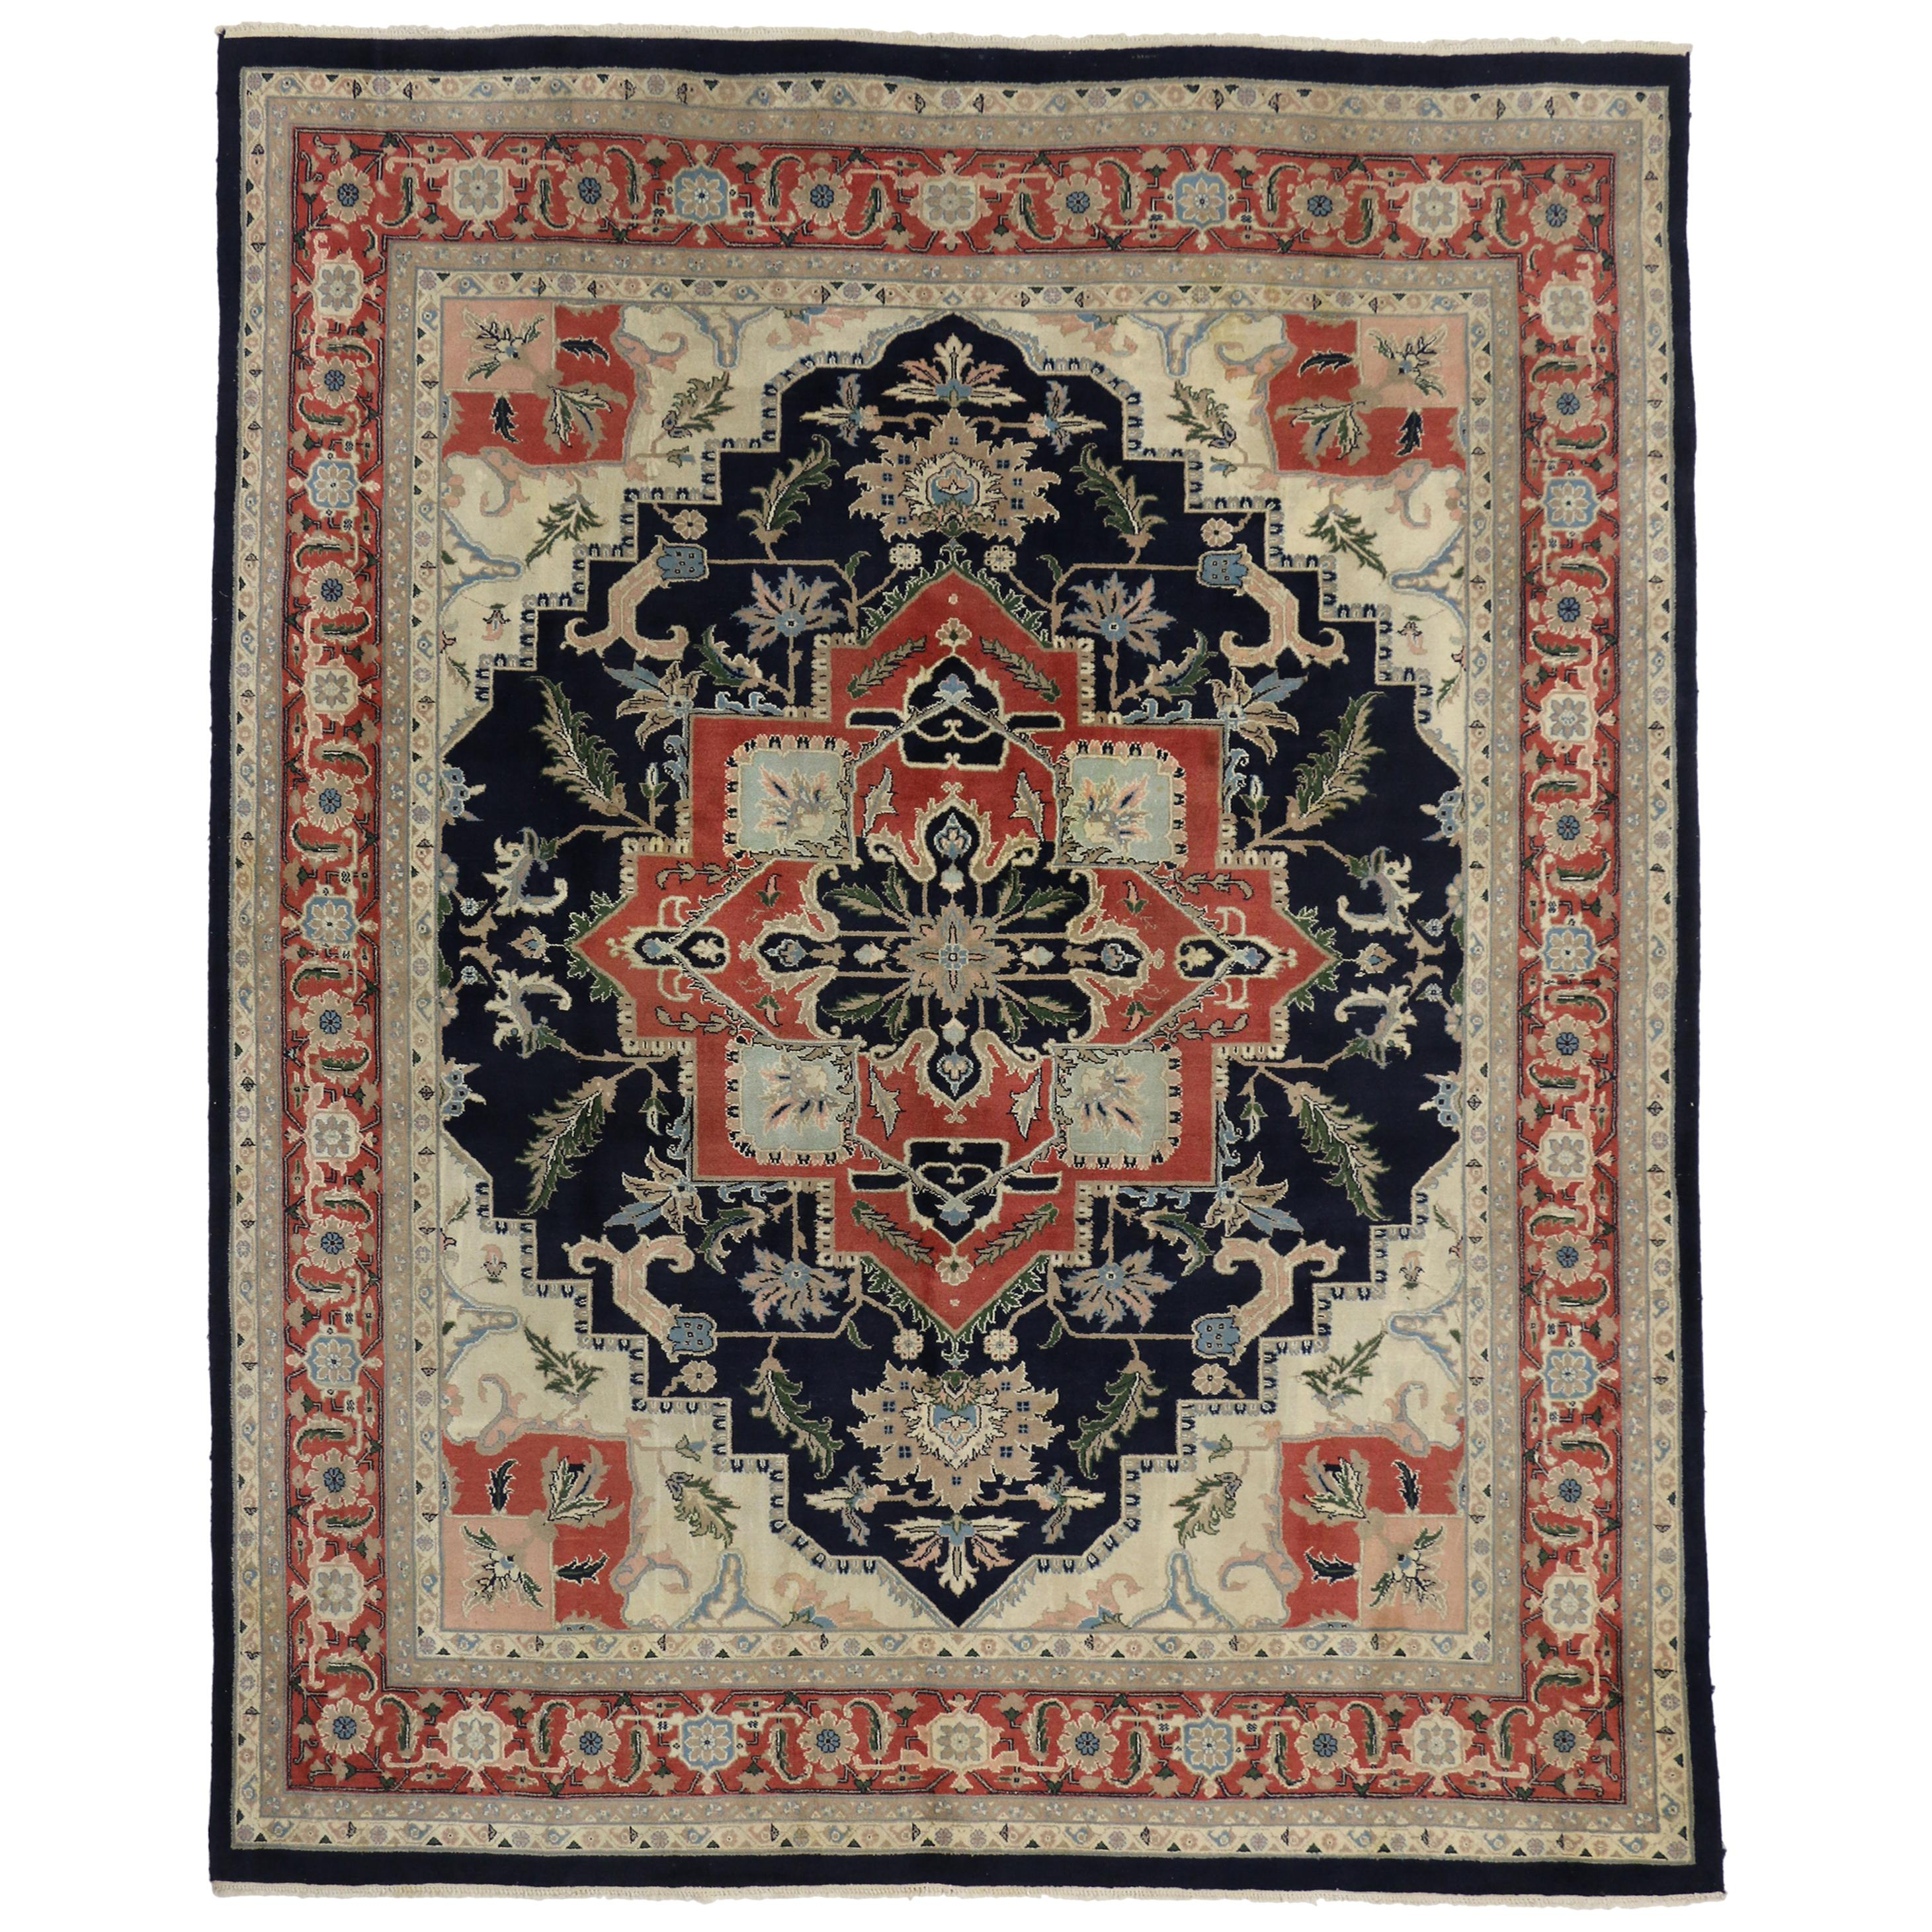 Vintage Persian Style Rug with Tabriz Design